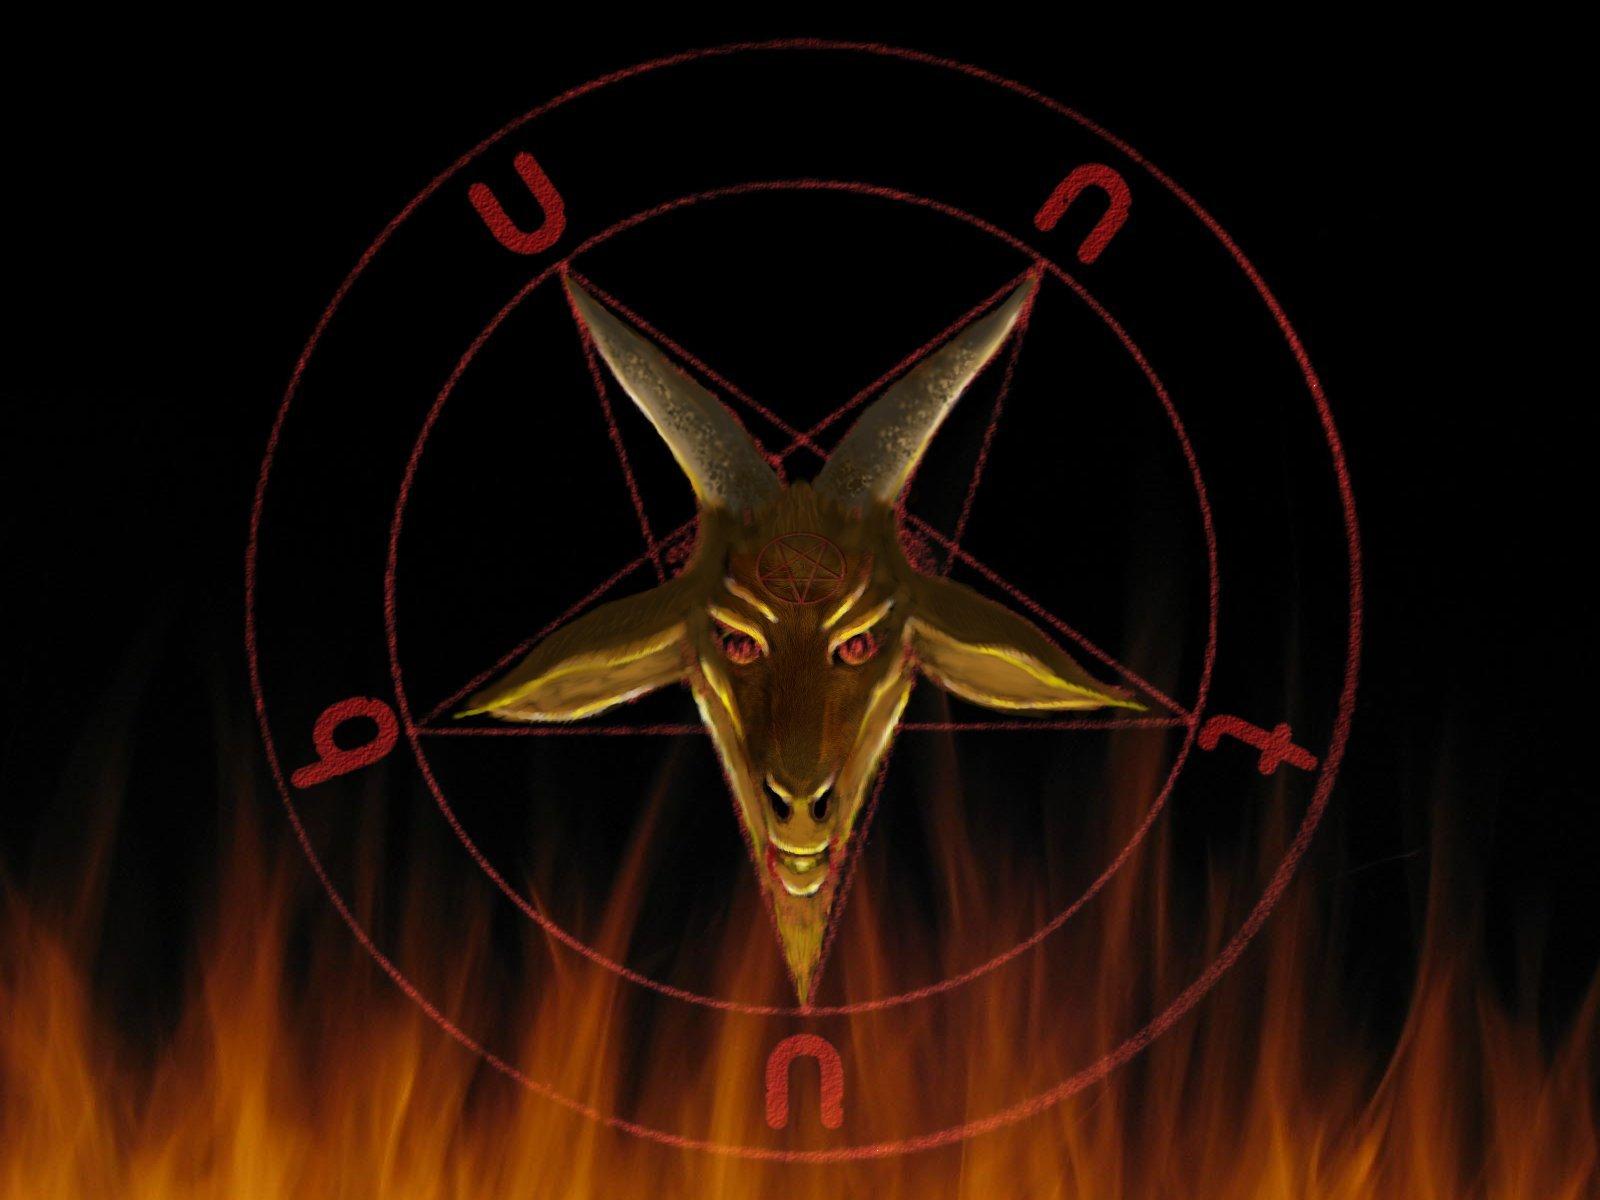 ВГреции пара туристов принесла себя вжертву Сатане